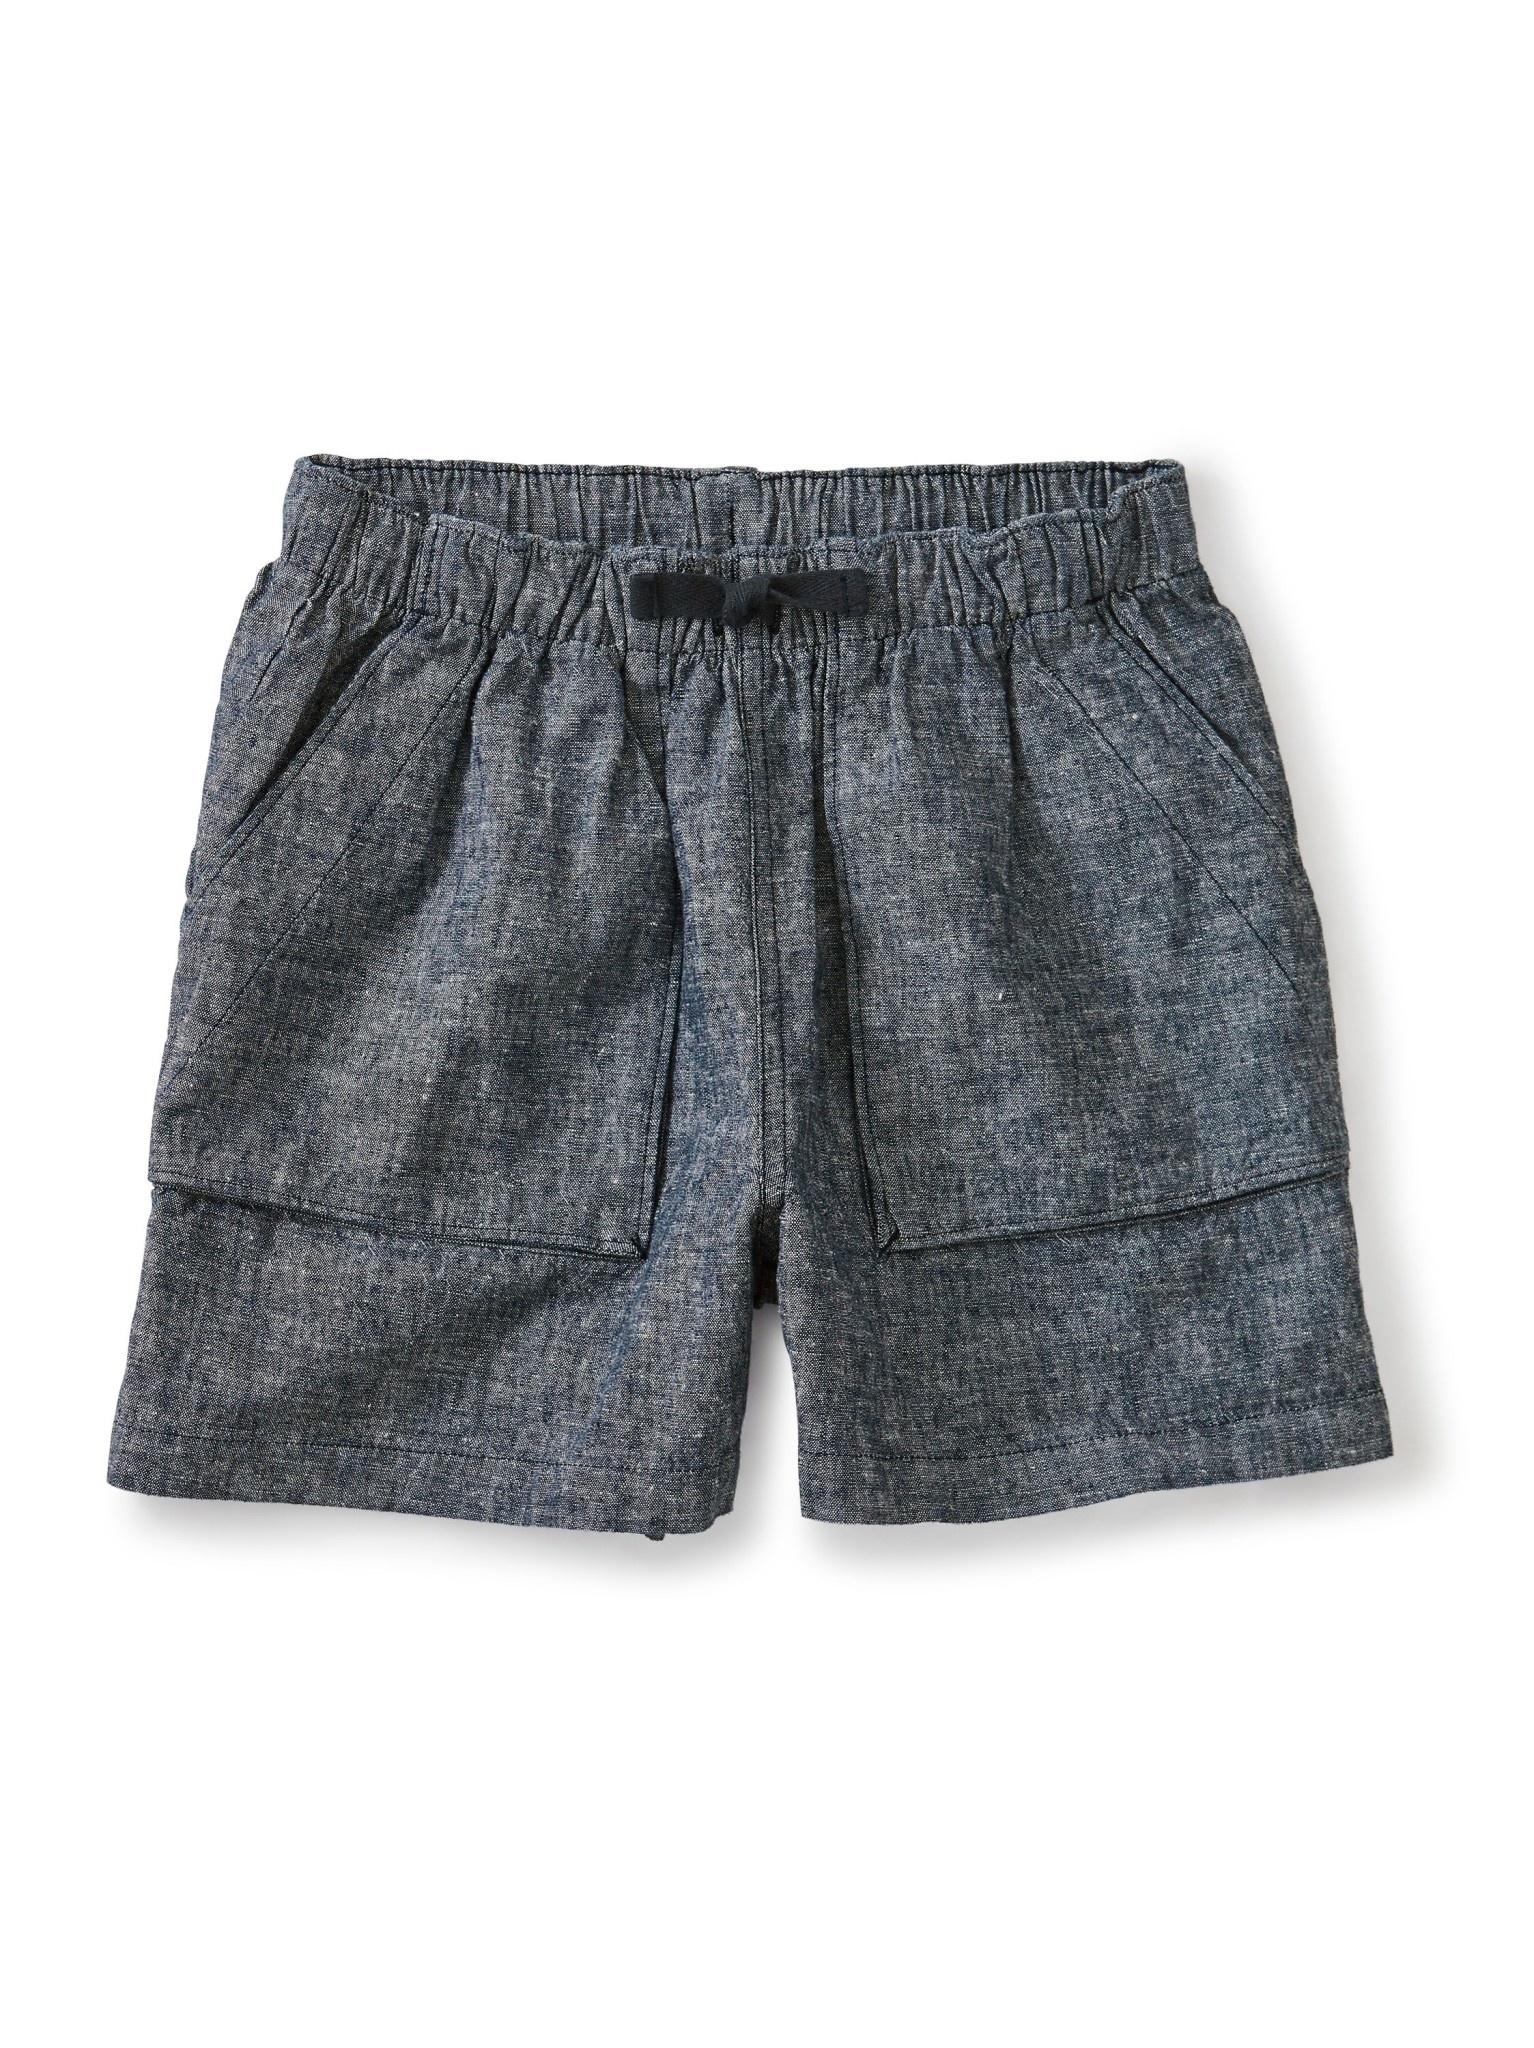 Tea Collection Blue Camp Shorts